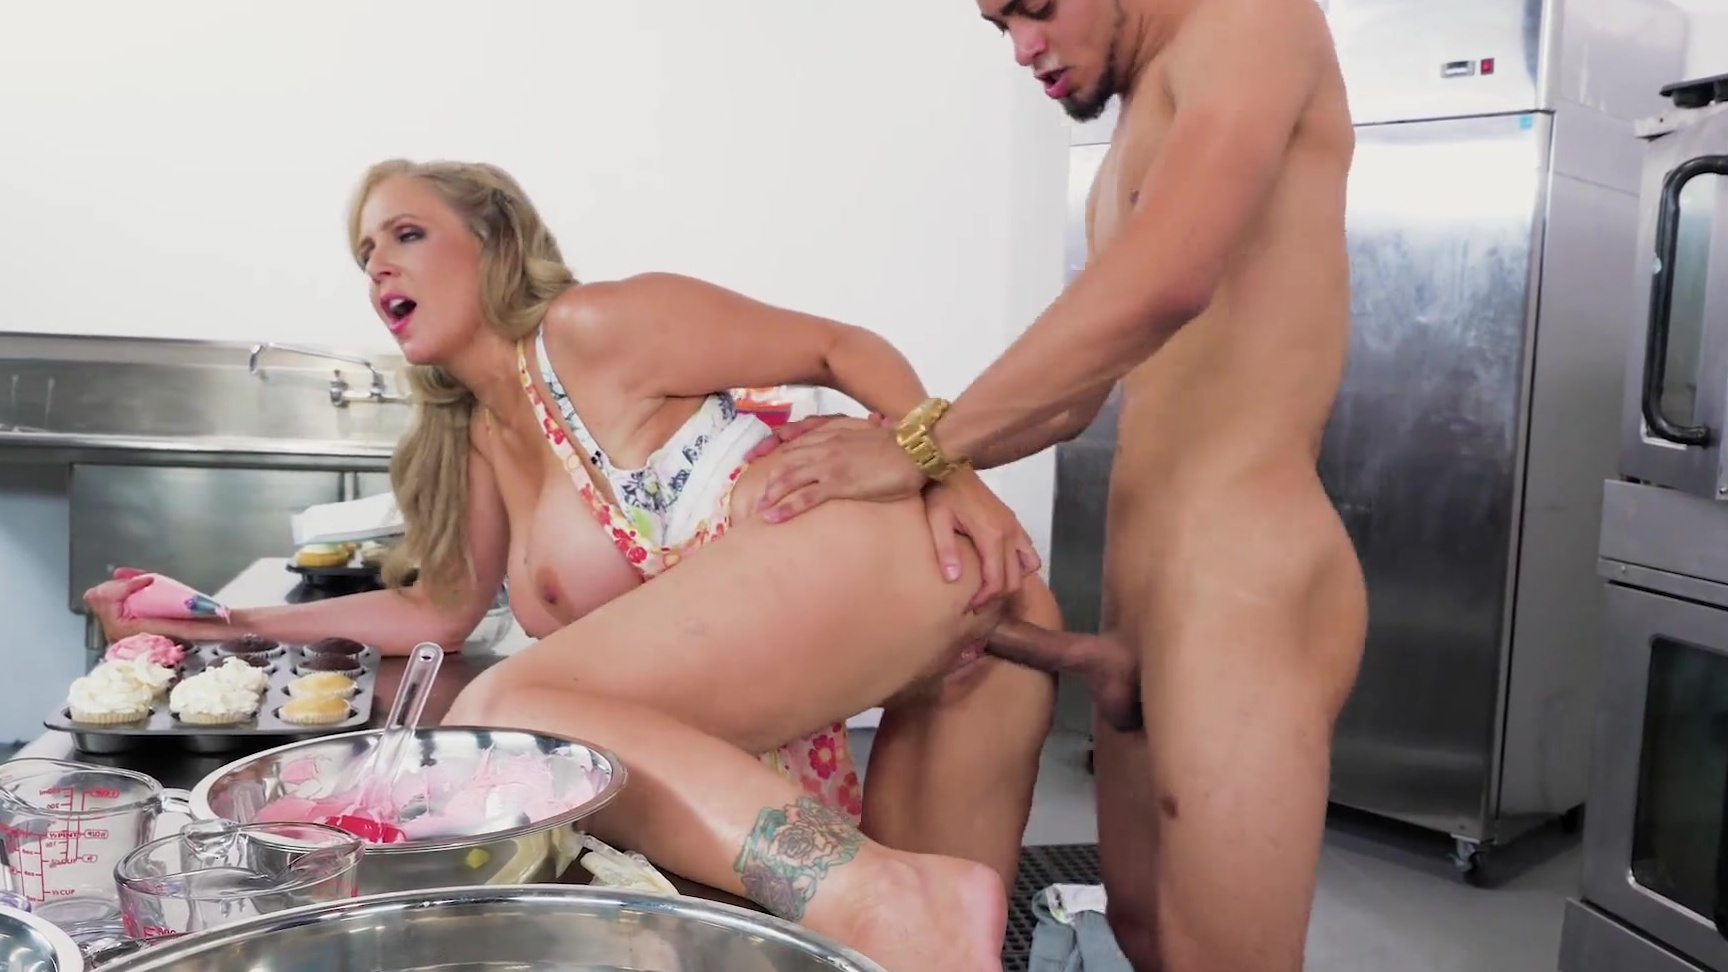 Juliya ann kichan boobs nude xxx